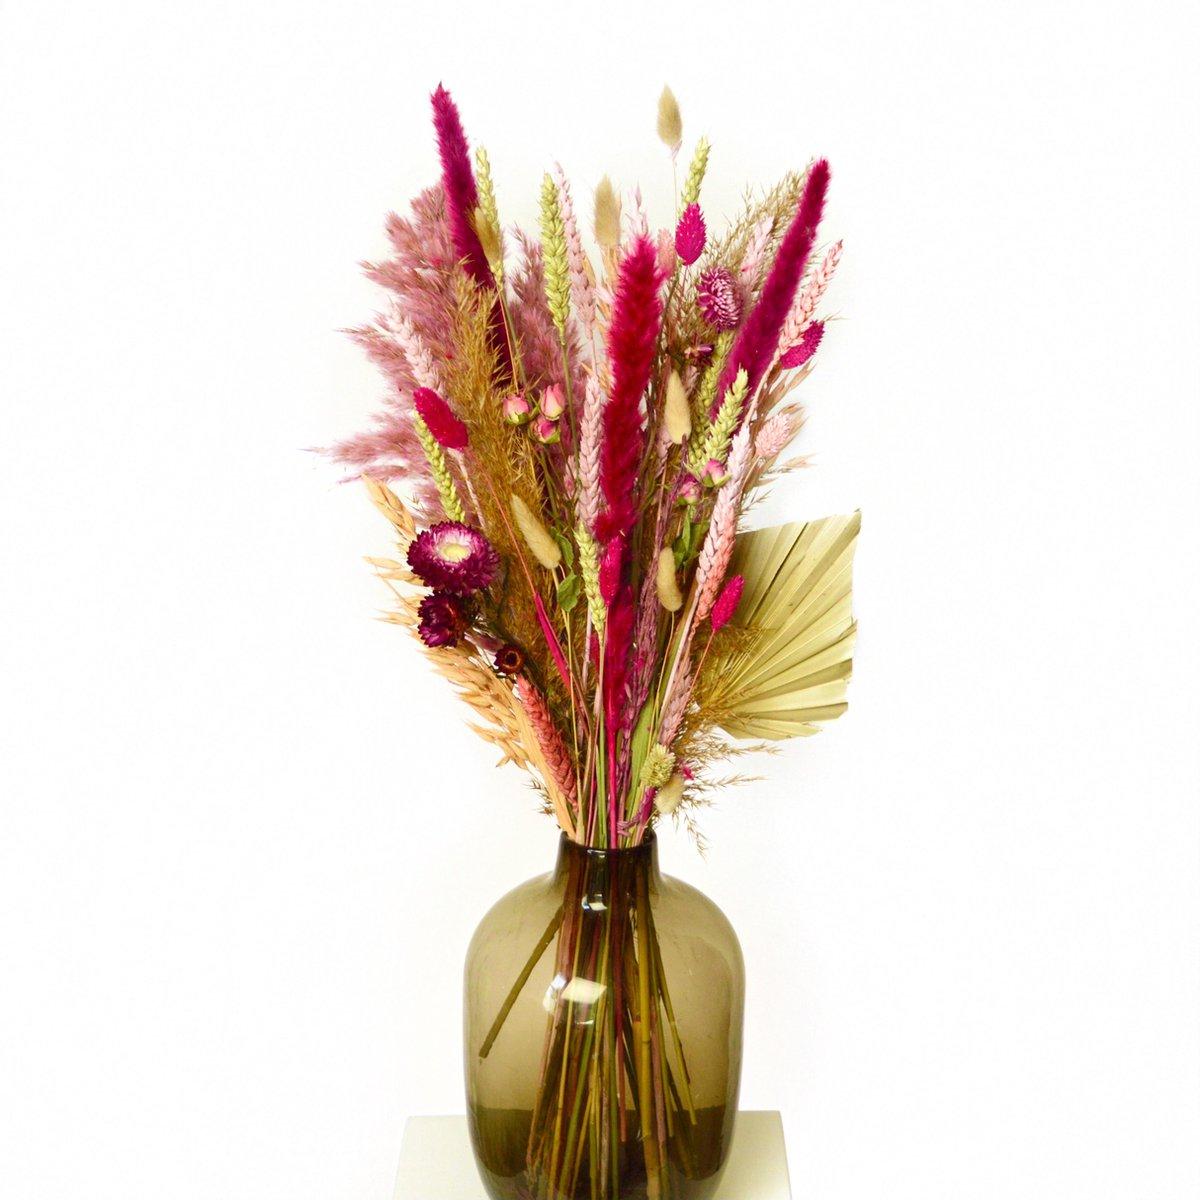 Droogbloemen - Hoogwaardig Droogboeket- 70 cm - Cadeau - Bloemen - Licht roze - Medium